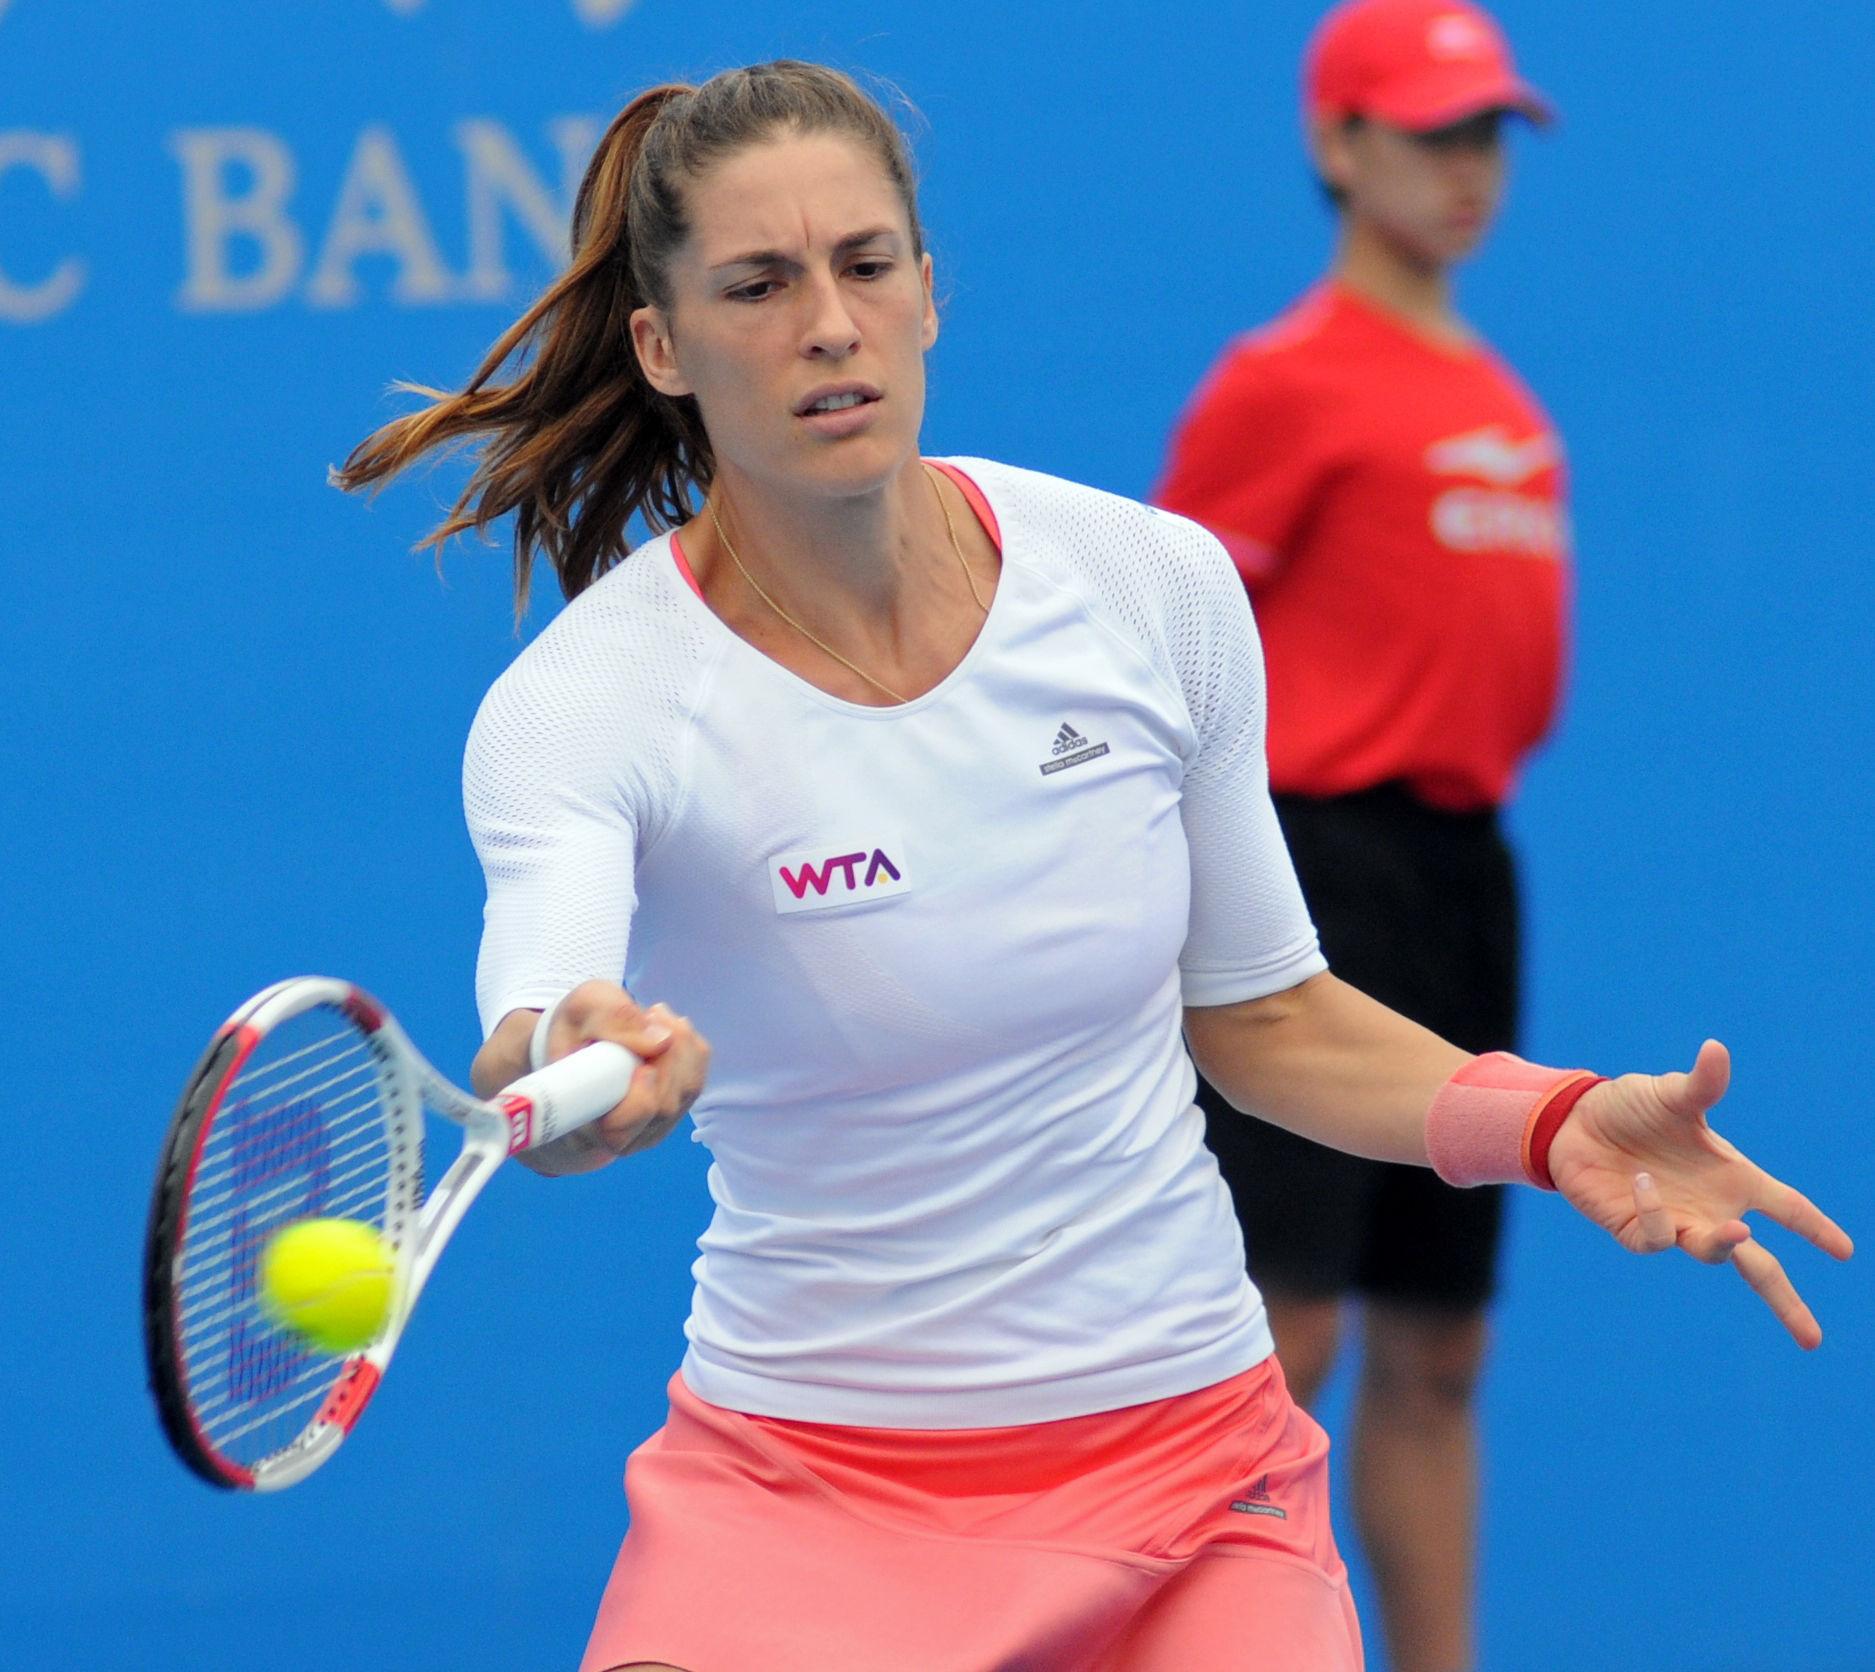 Photo of Andrea Petkovic: German tennis player